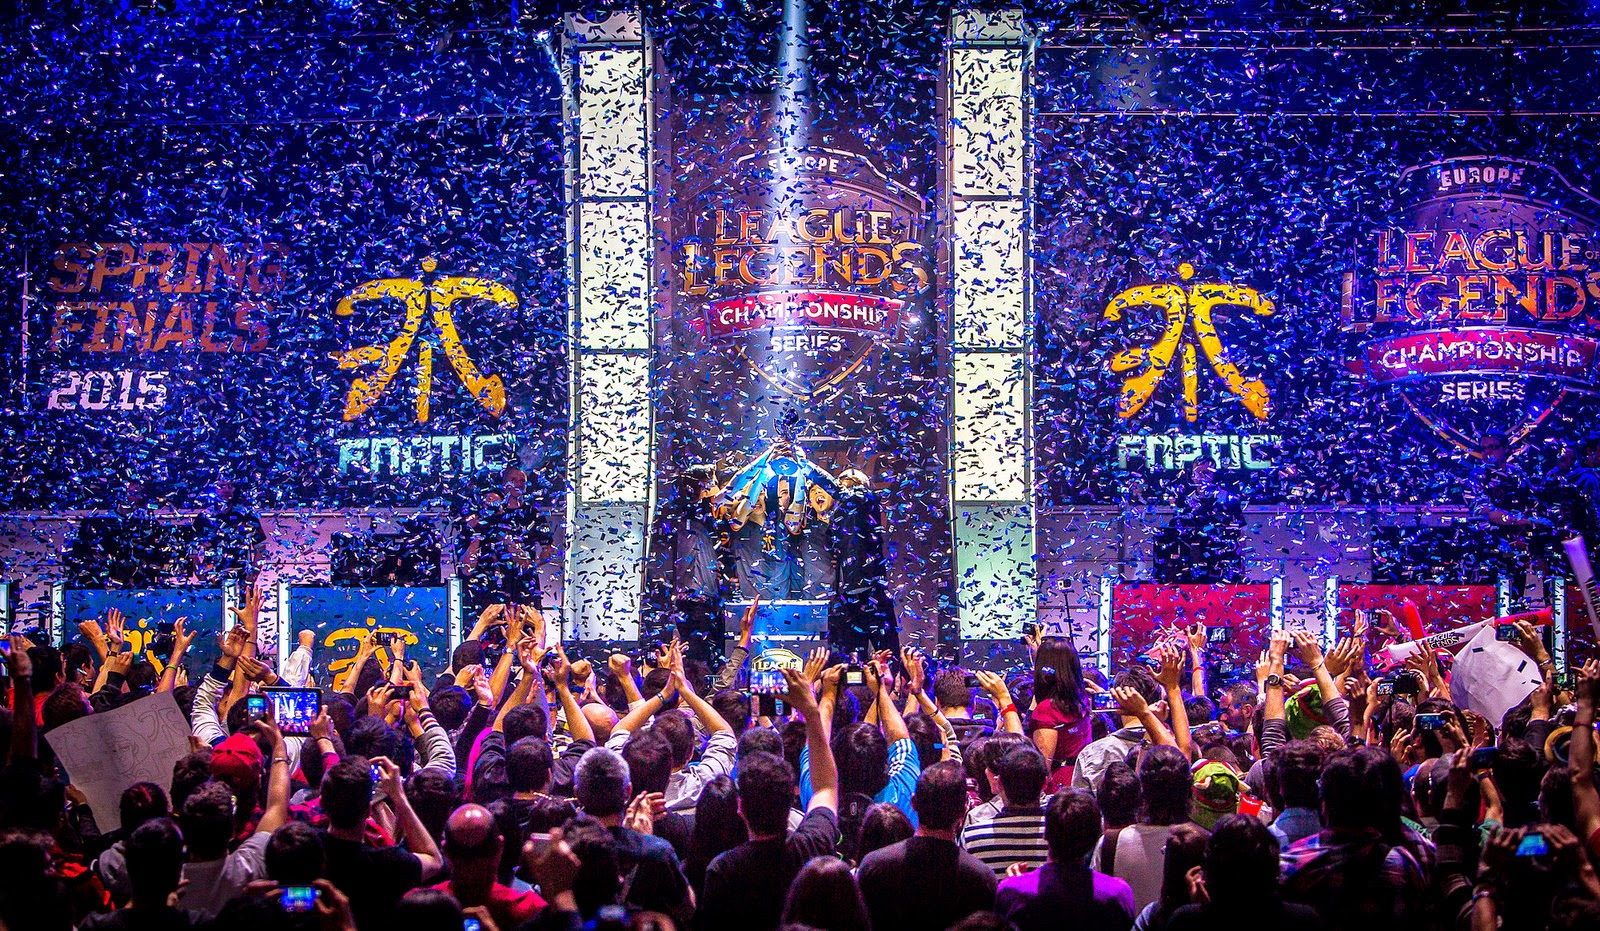 Fnatic gana a Unicorns of Love en épico final de la copa Europea de League of Legends